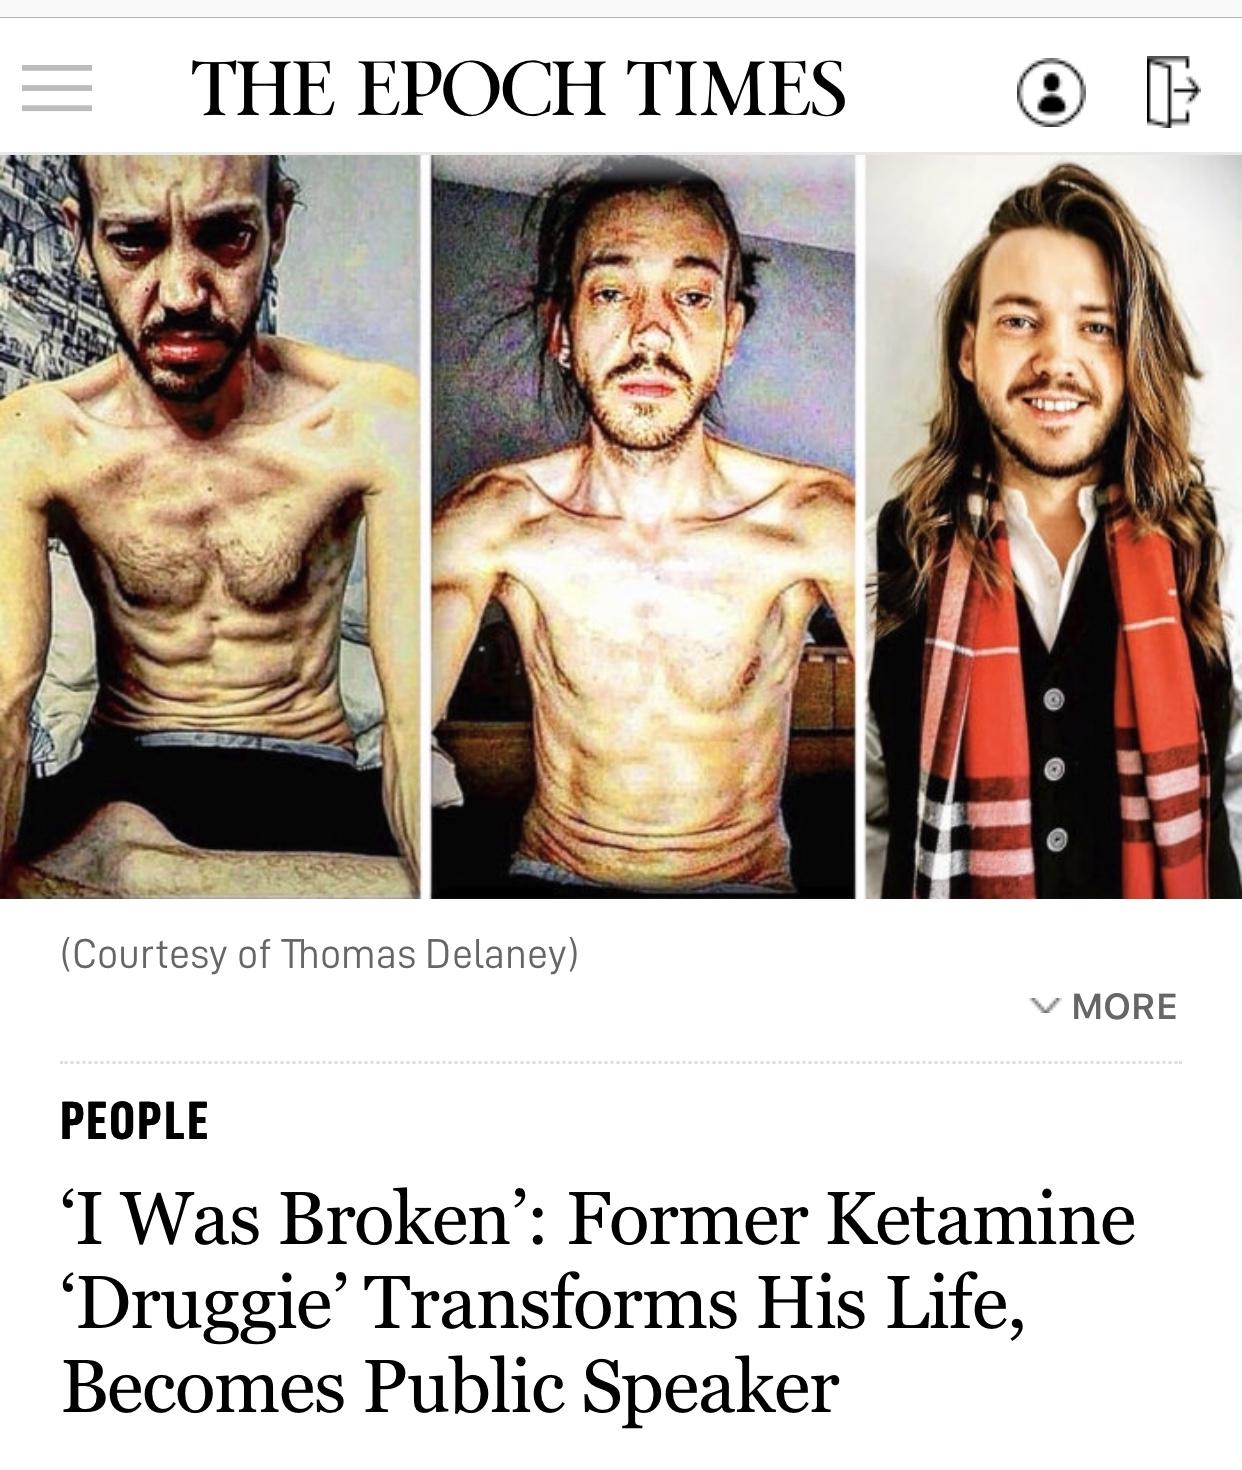 'I Was Broken': Former Ketamine 'Druggie' Transforms His Life, Becomes Public Speaker